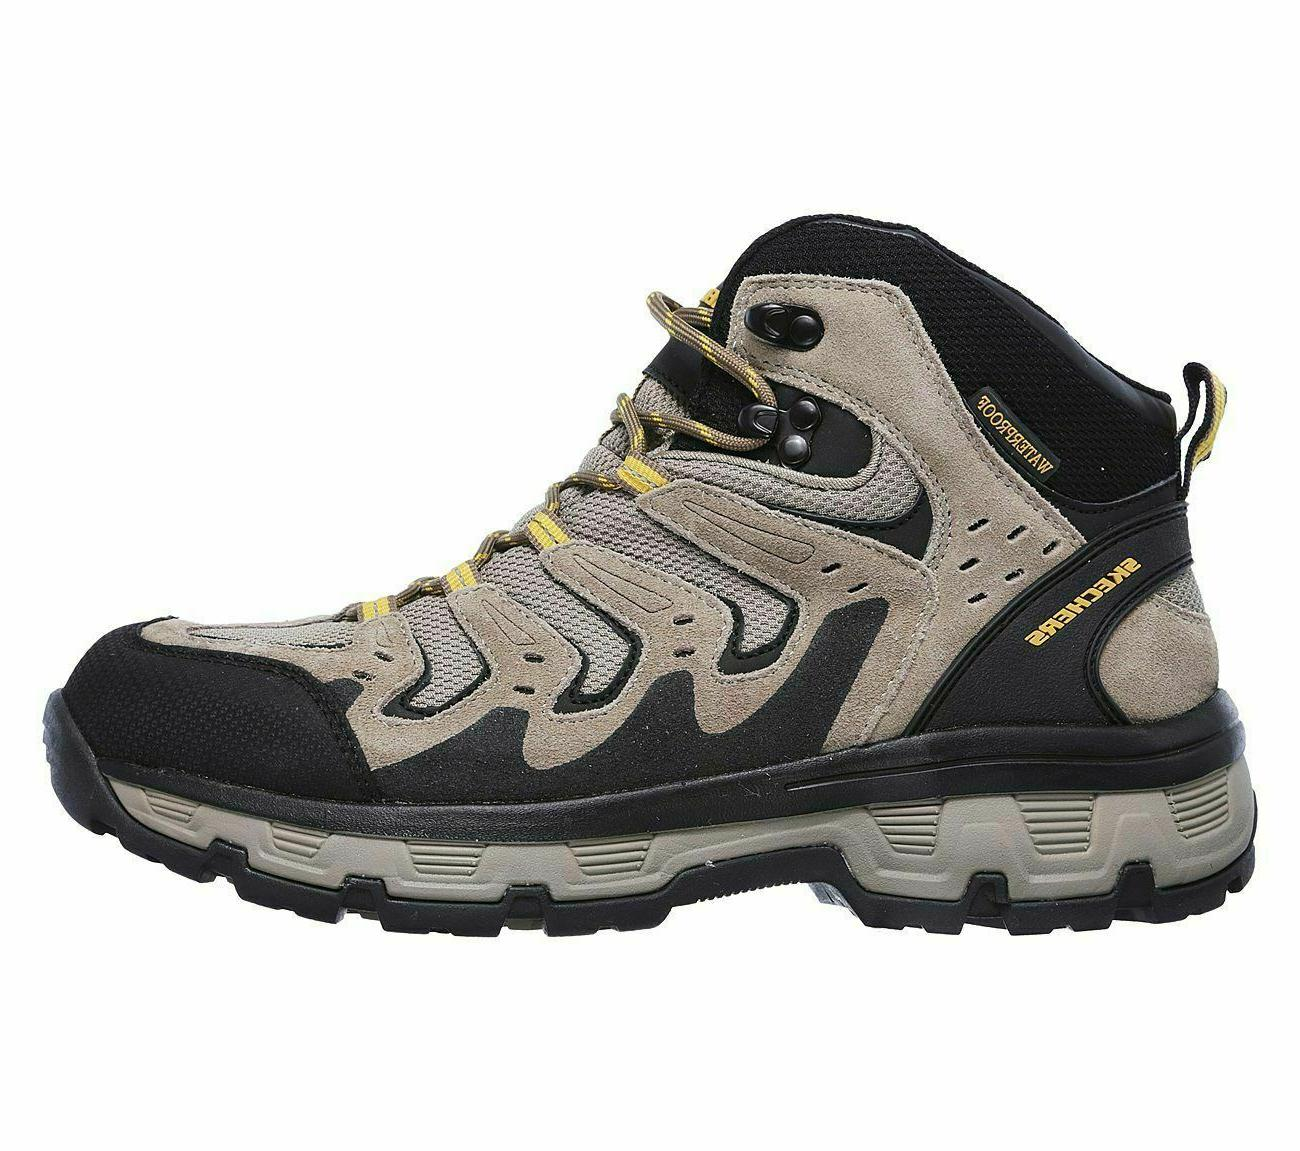 Morson Gelson Hiking Boots Tan $90 Shipping